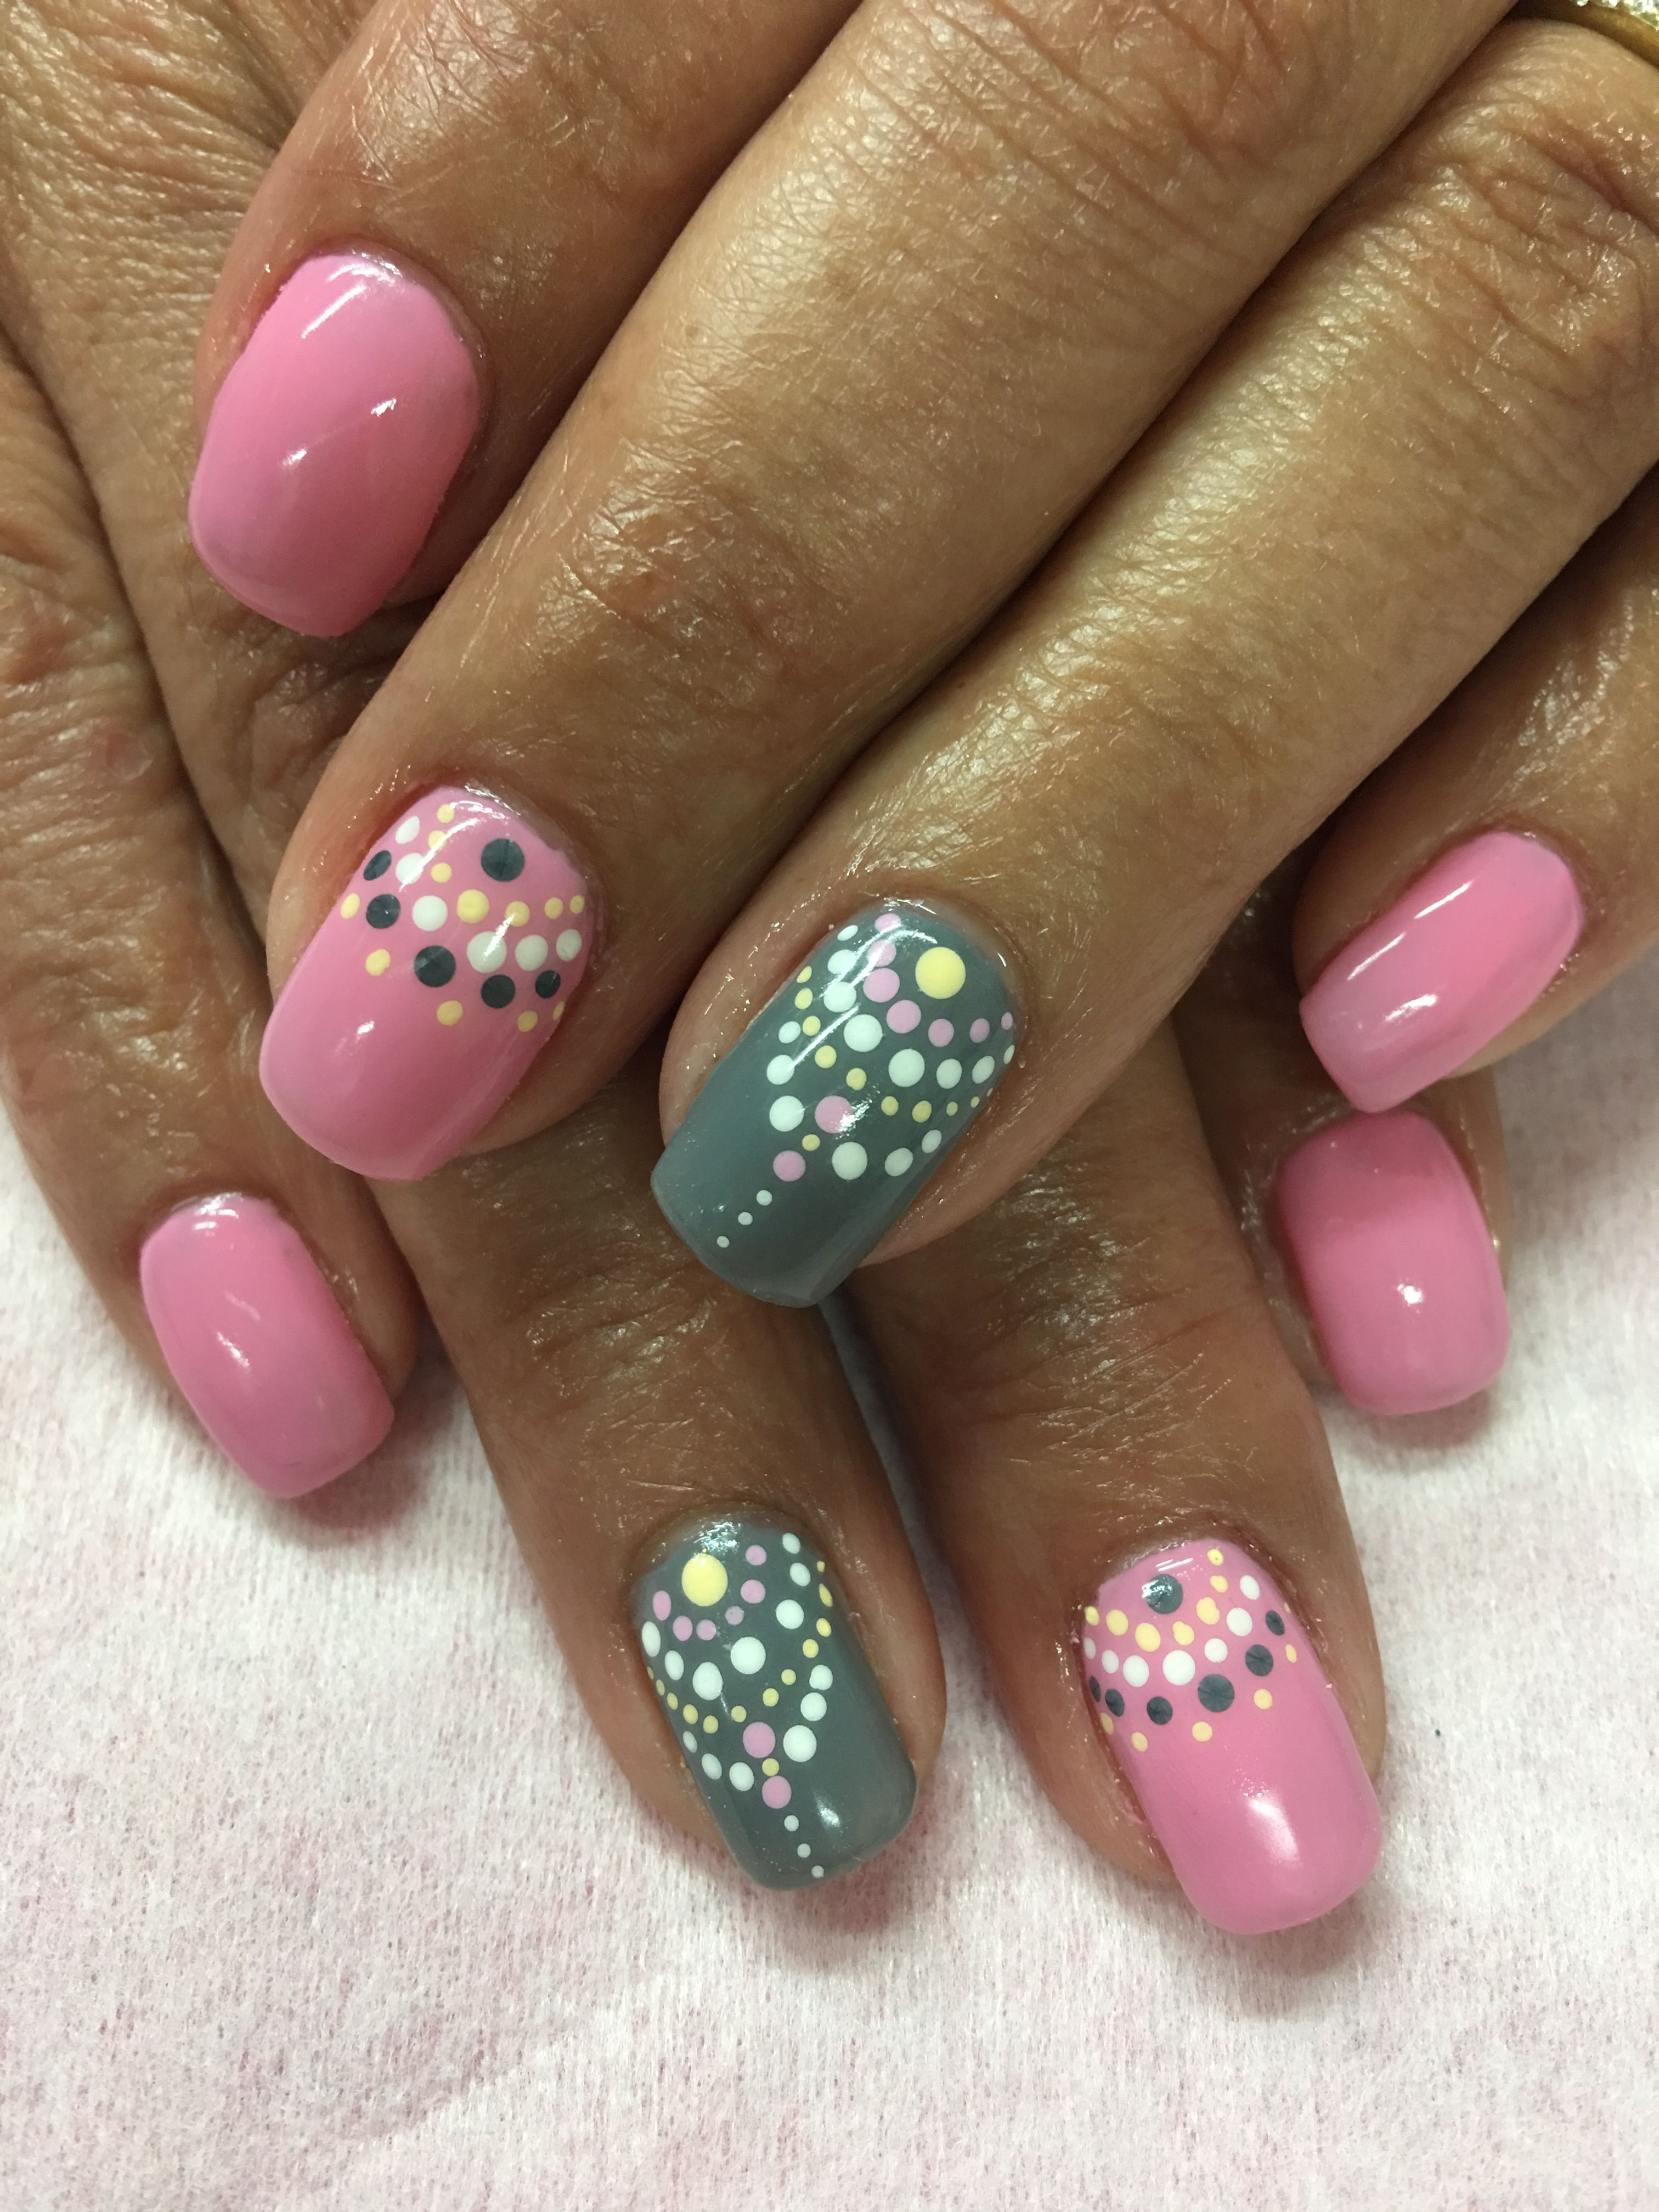 Boho Gel Nails Pink, Grey & pale yellow dot design Gel Nails | Gel ...